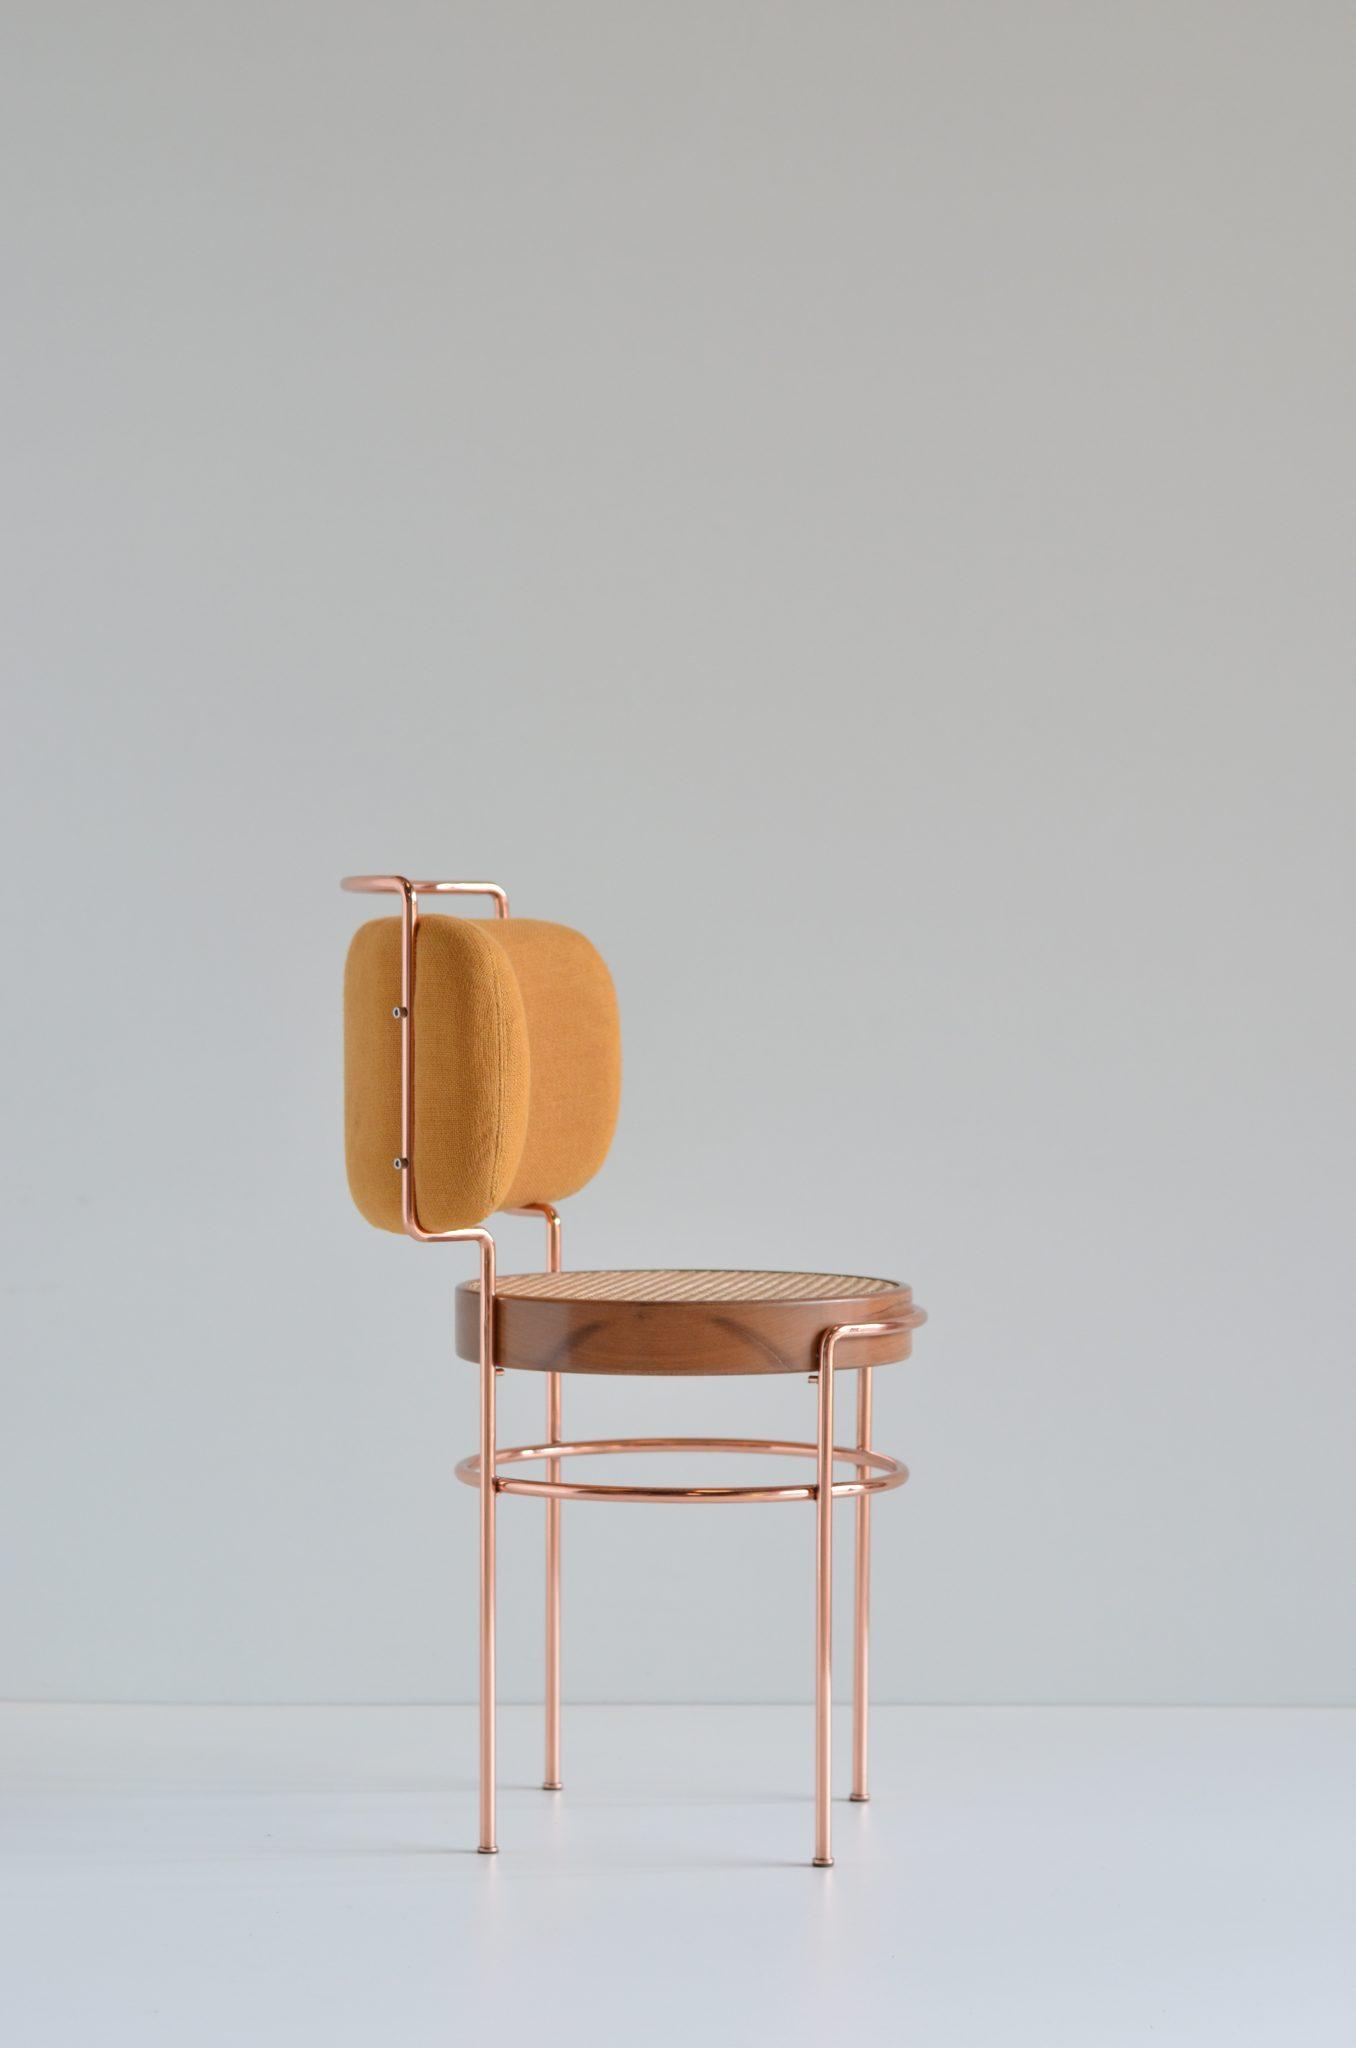 cadeira iaiá - gusatvo bittencourt - boobam